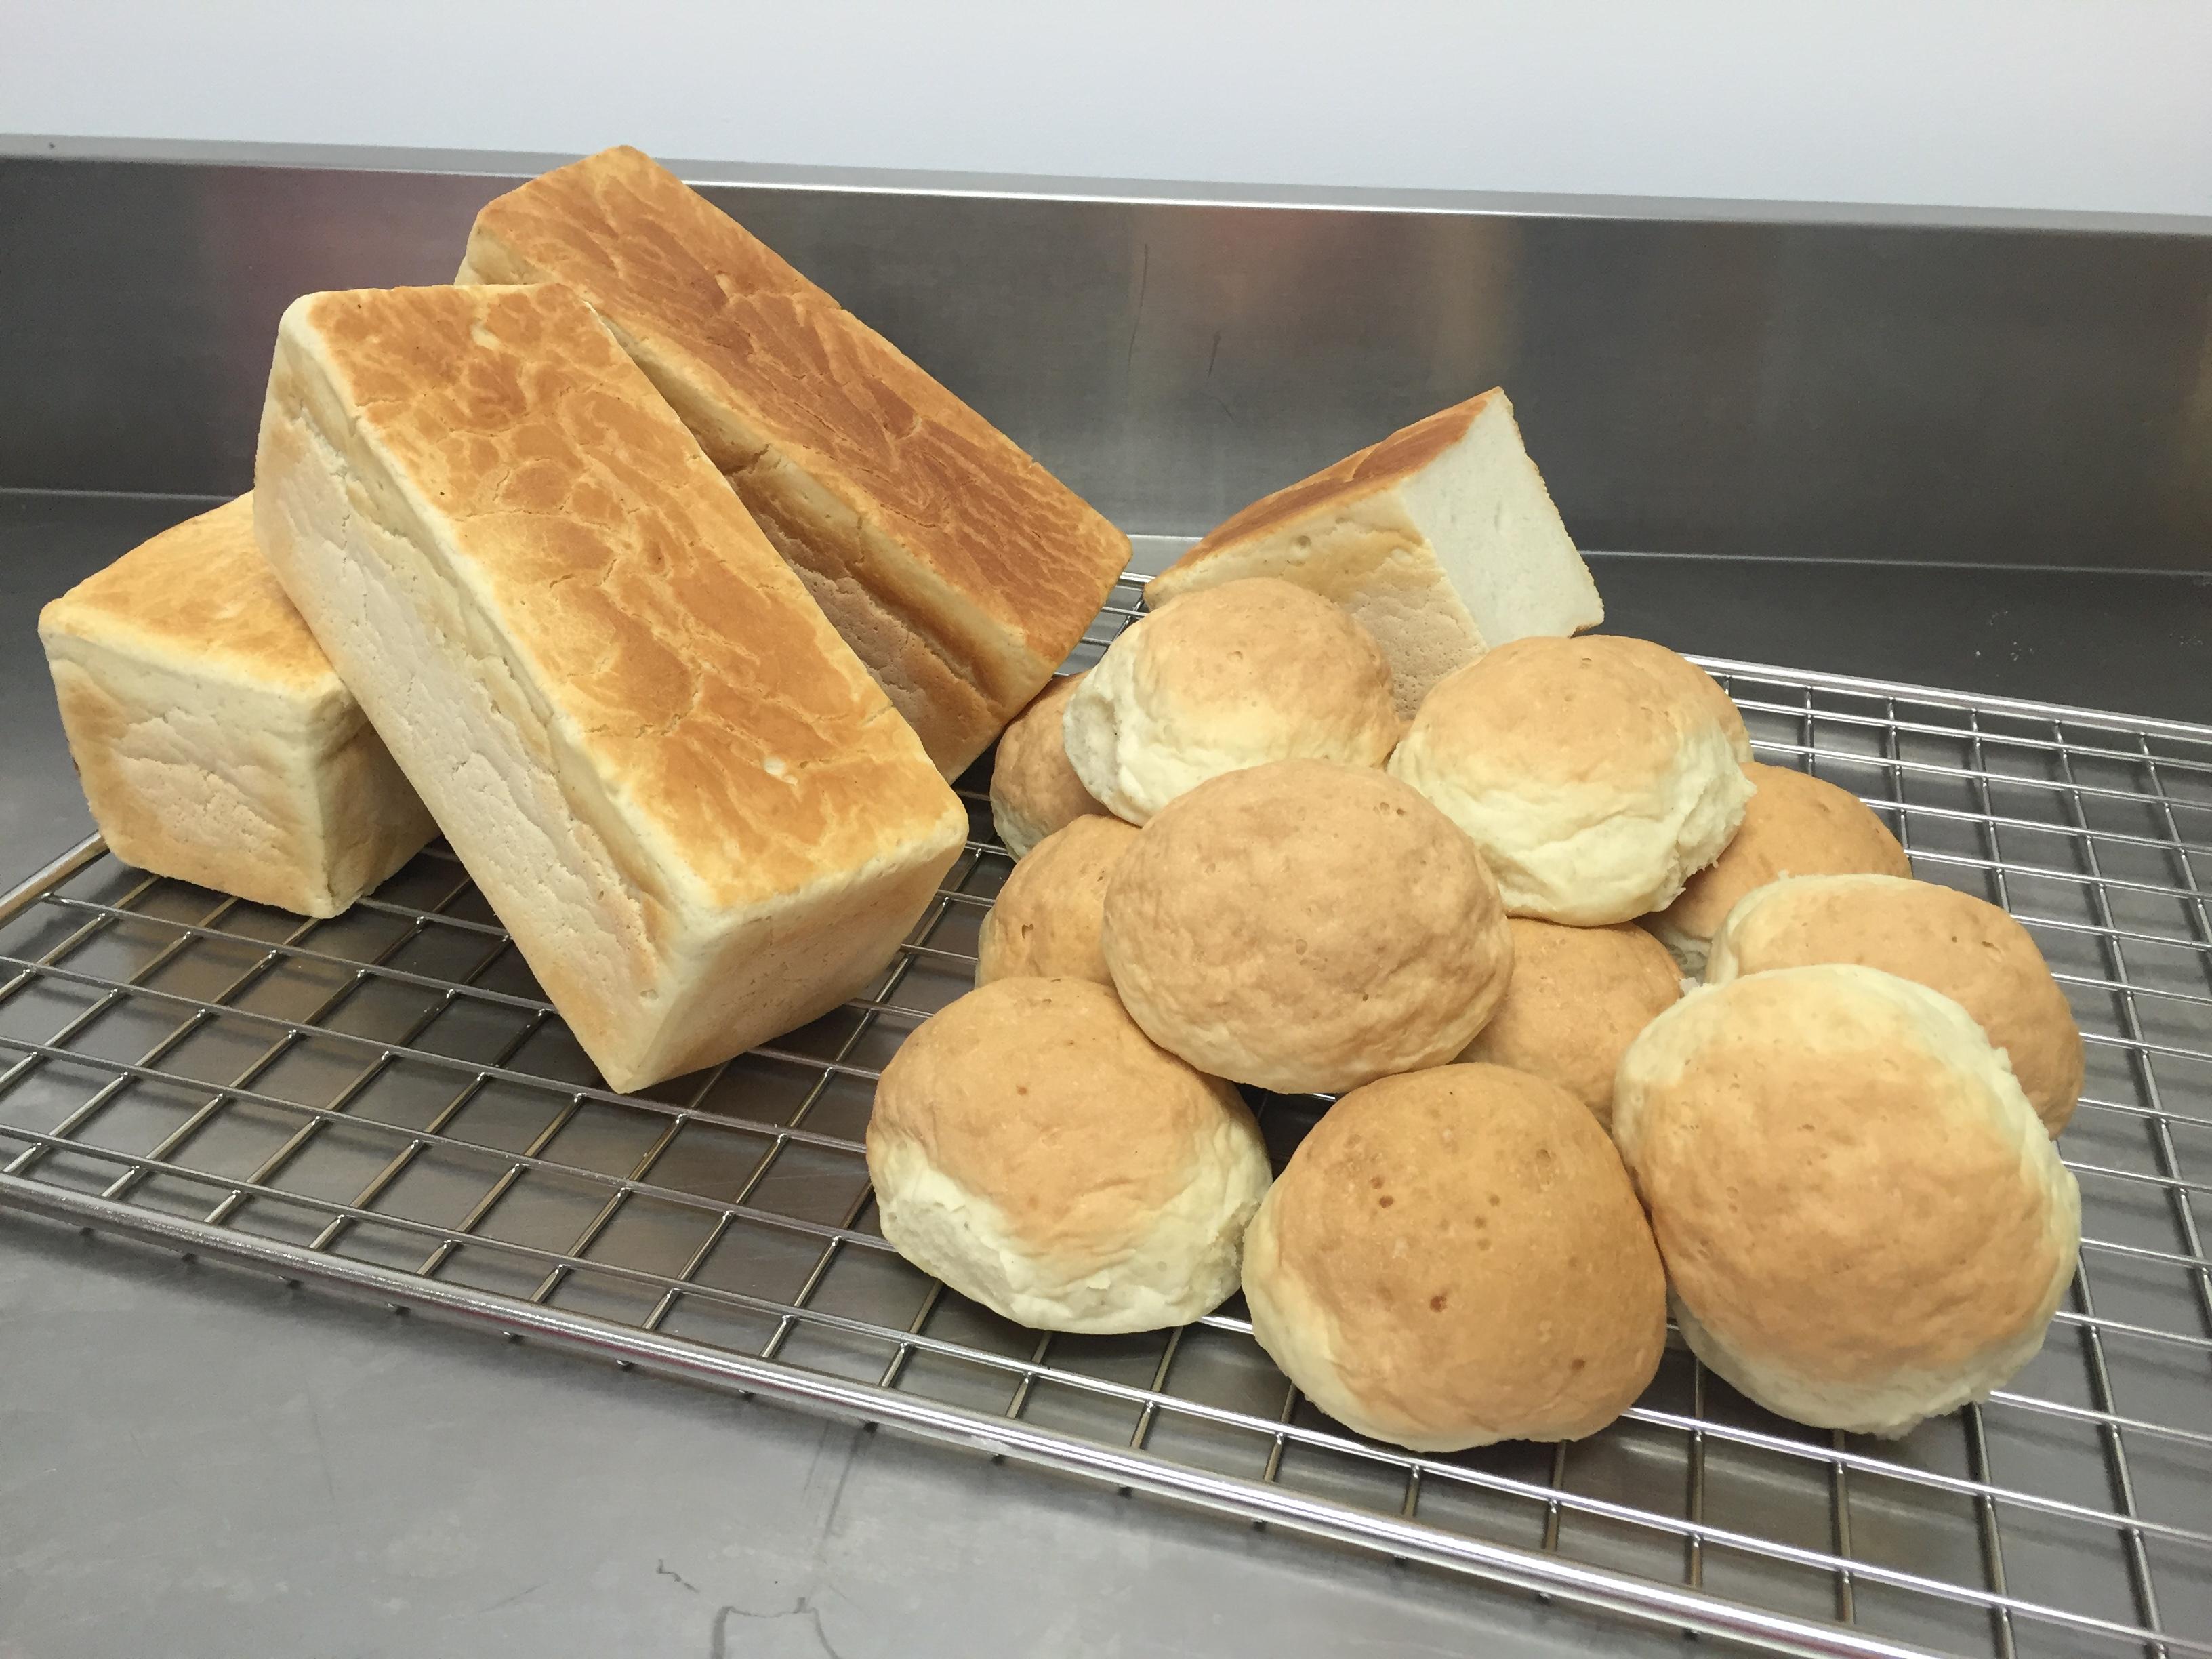 Soft white gluten free bread slices with ease at Artizan Gluten Free Bakery Rockhampton